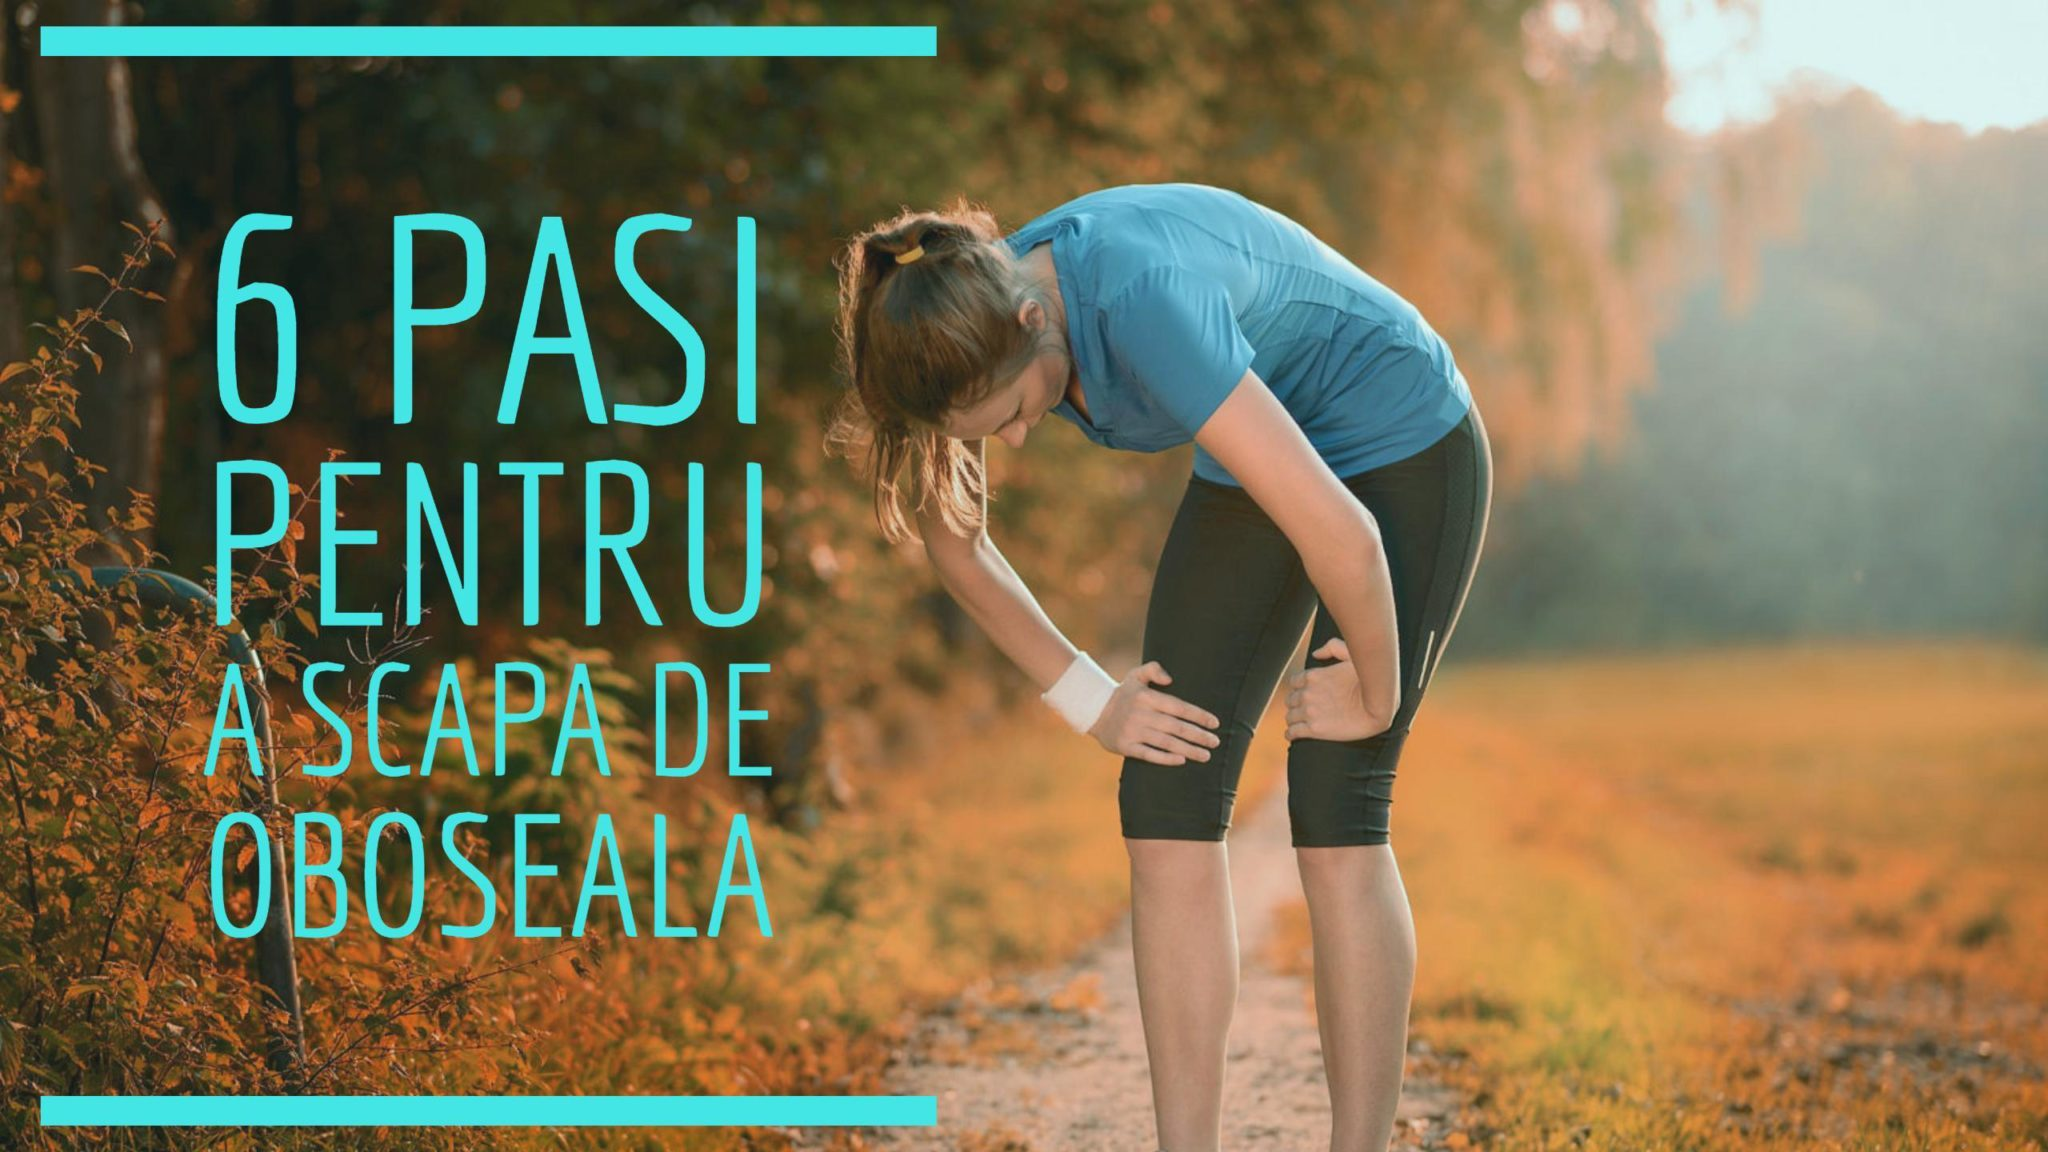 6 Pasi pentru a Scapa de OBOSEALA